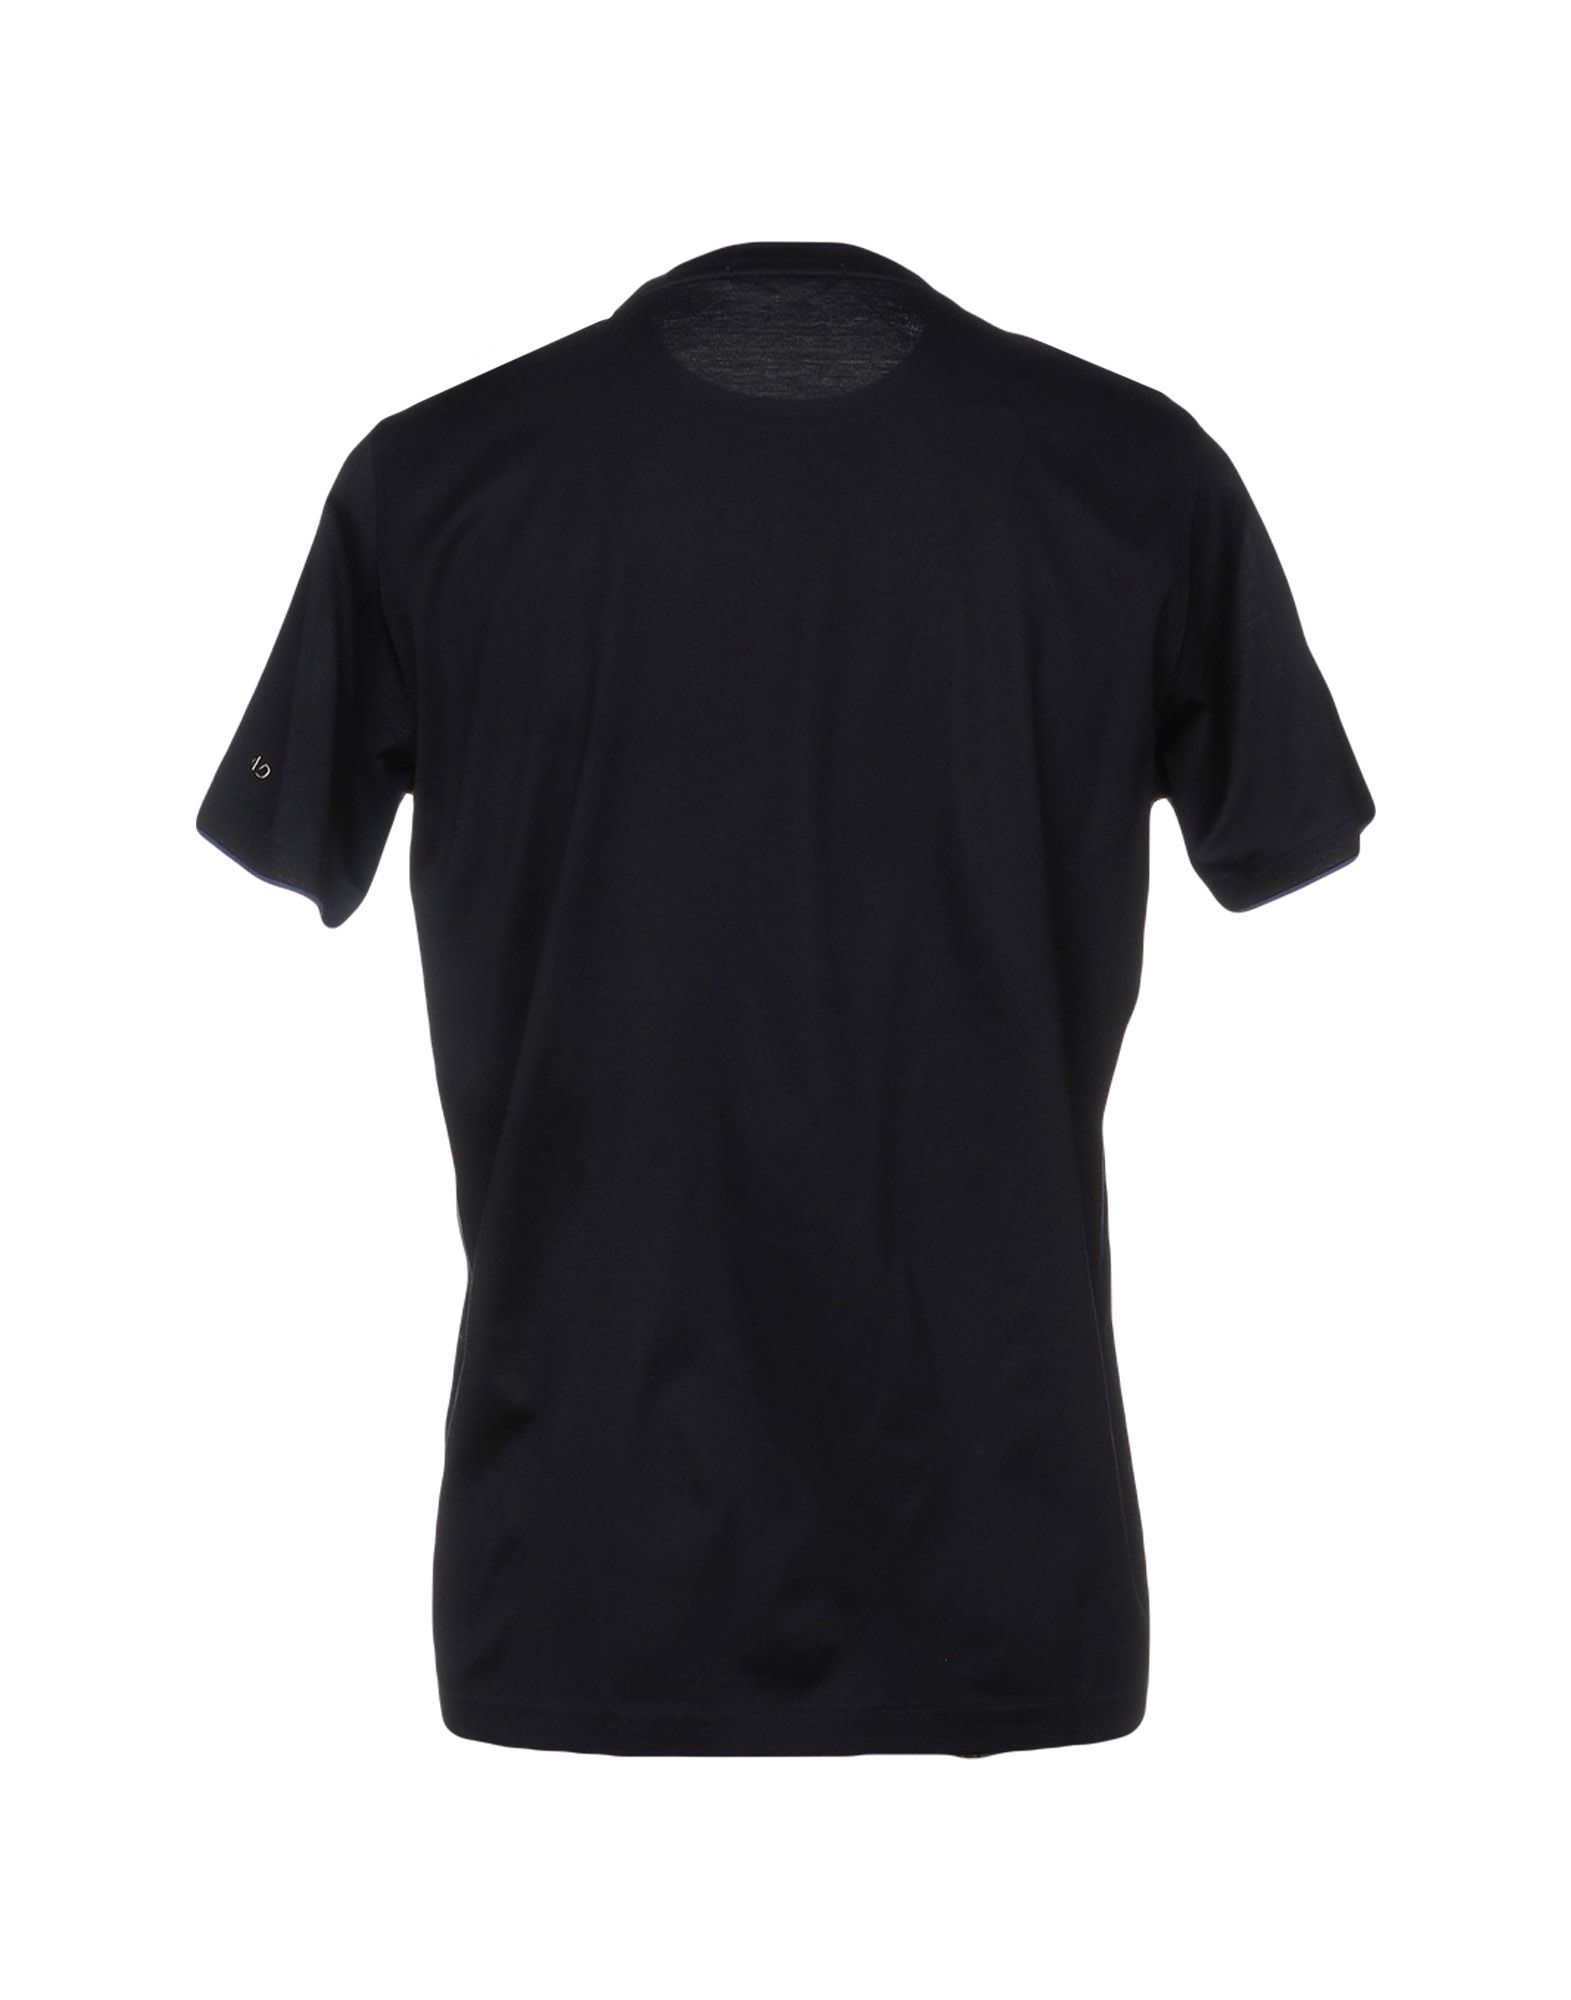 T-Shirt Alessandro Dell'acqua Uomo Uomo Uomo - 12095891TW 352552